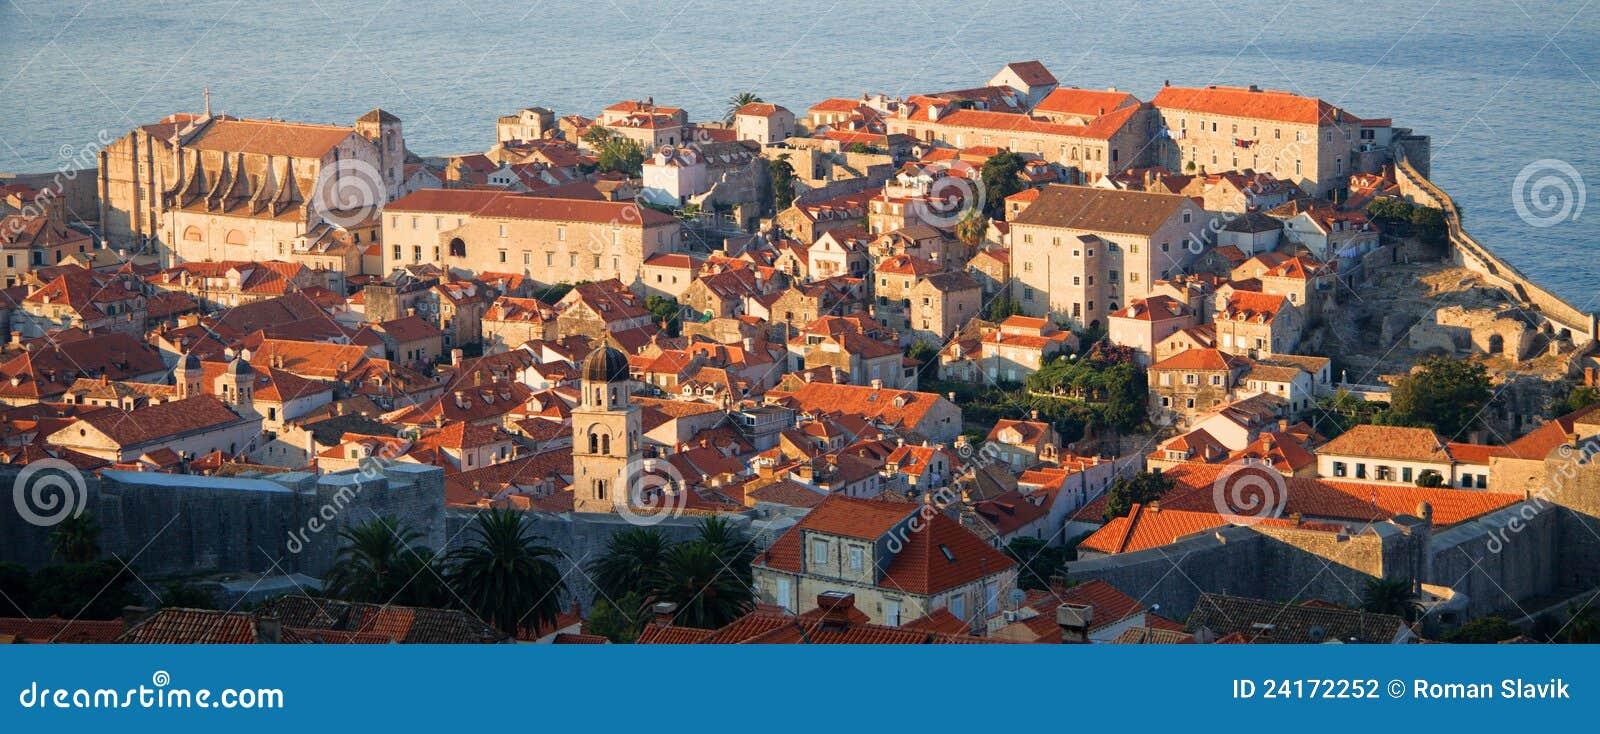 travel sea wallpaper panorama - photo #33